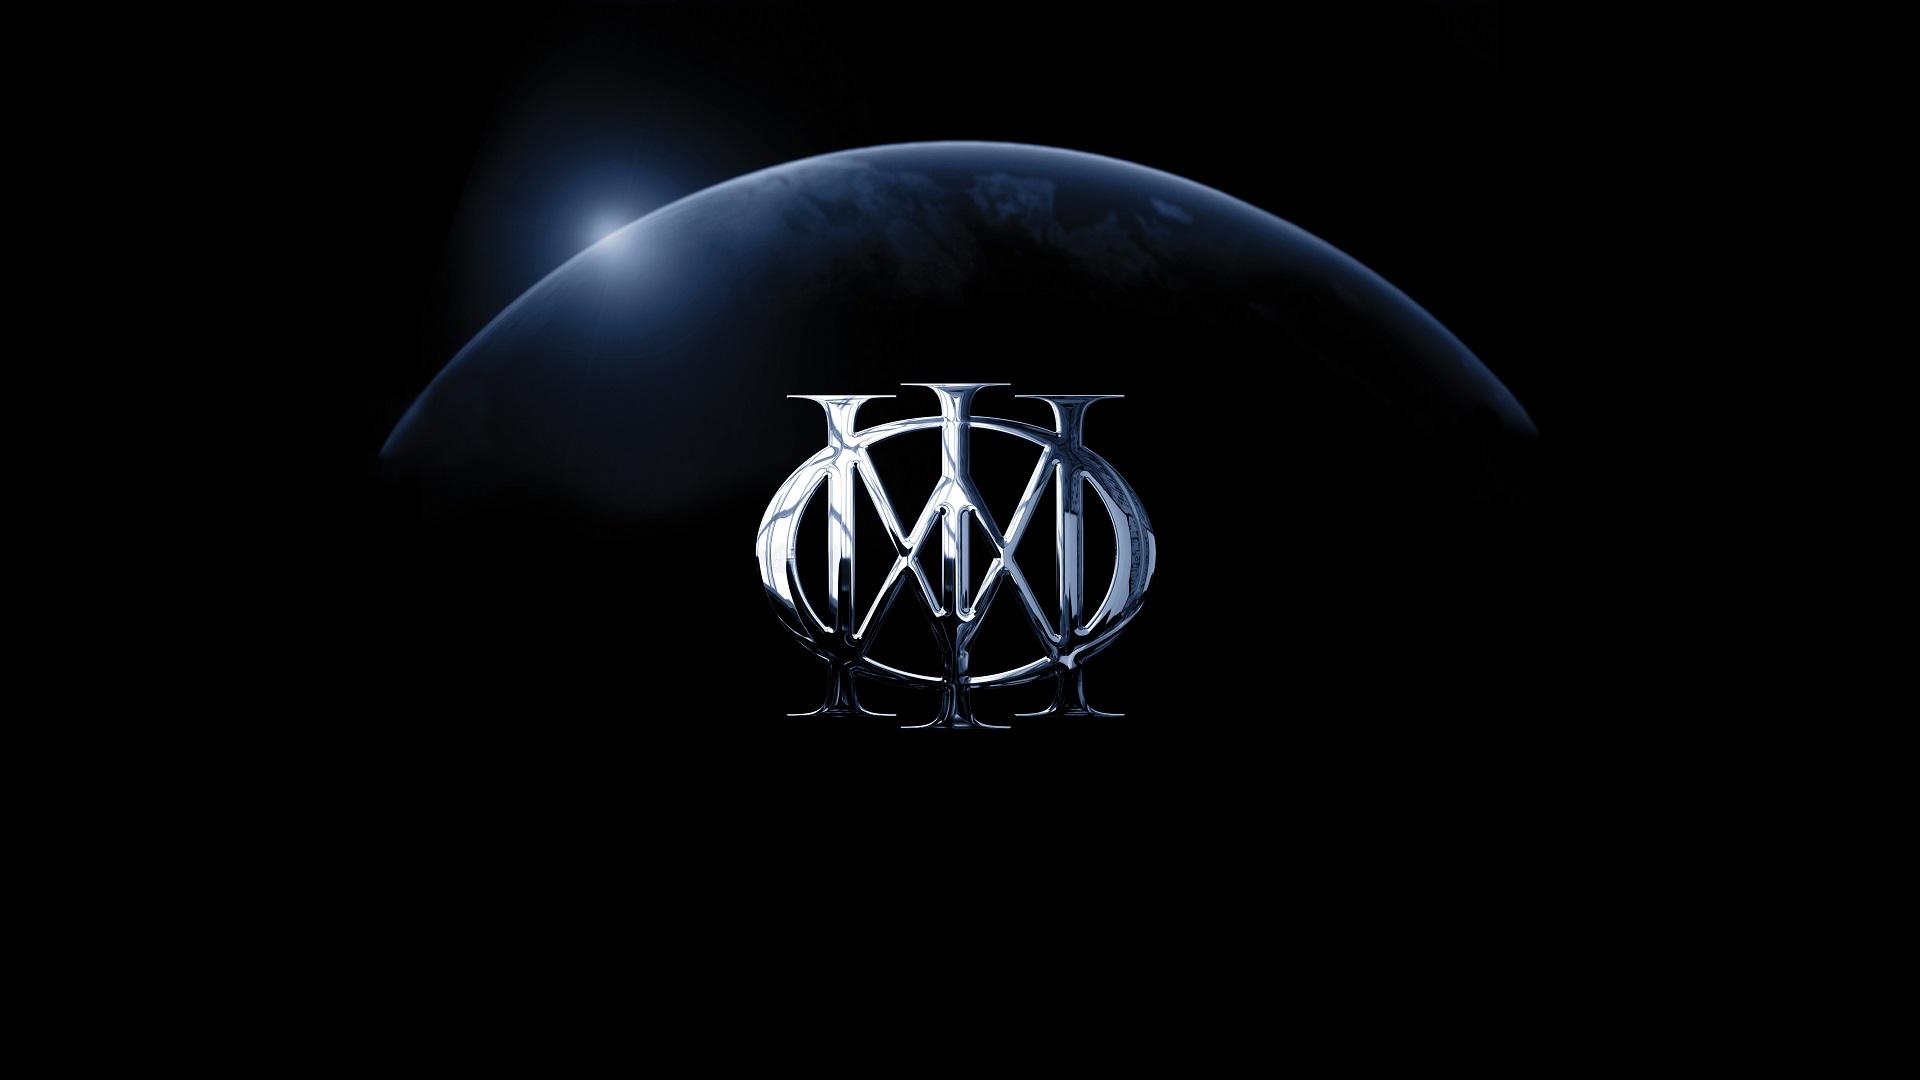 Dream Theater Dream Theater Wallpaper By Mateelias On Deviantart